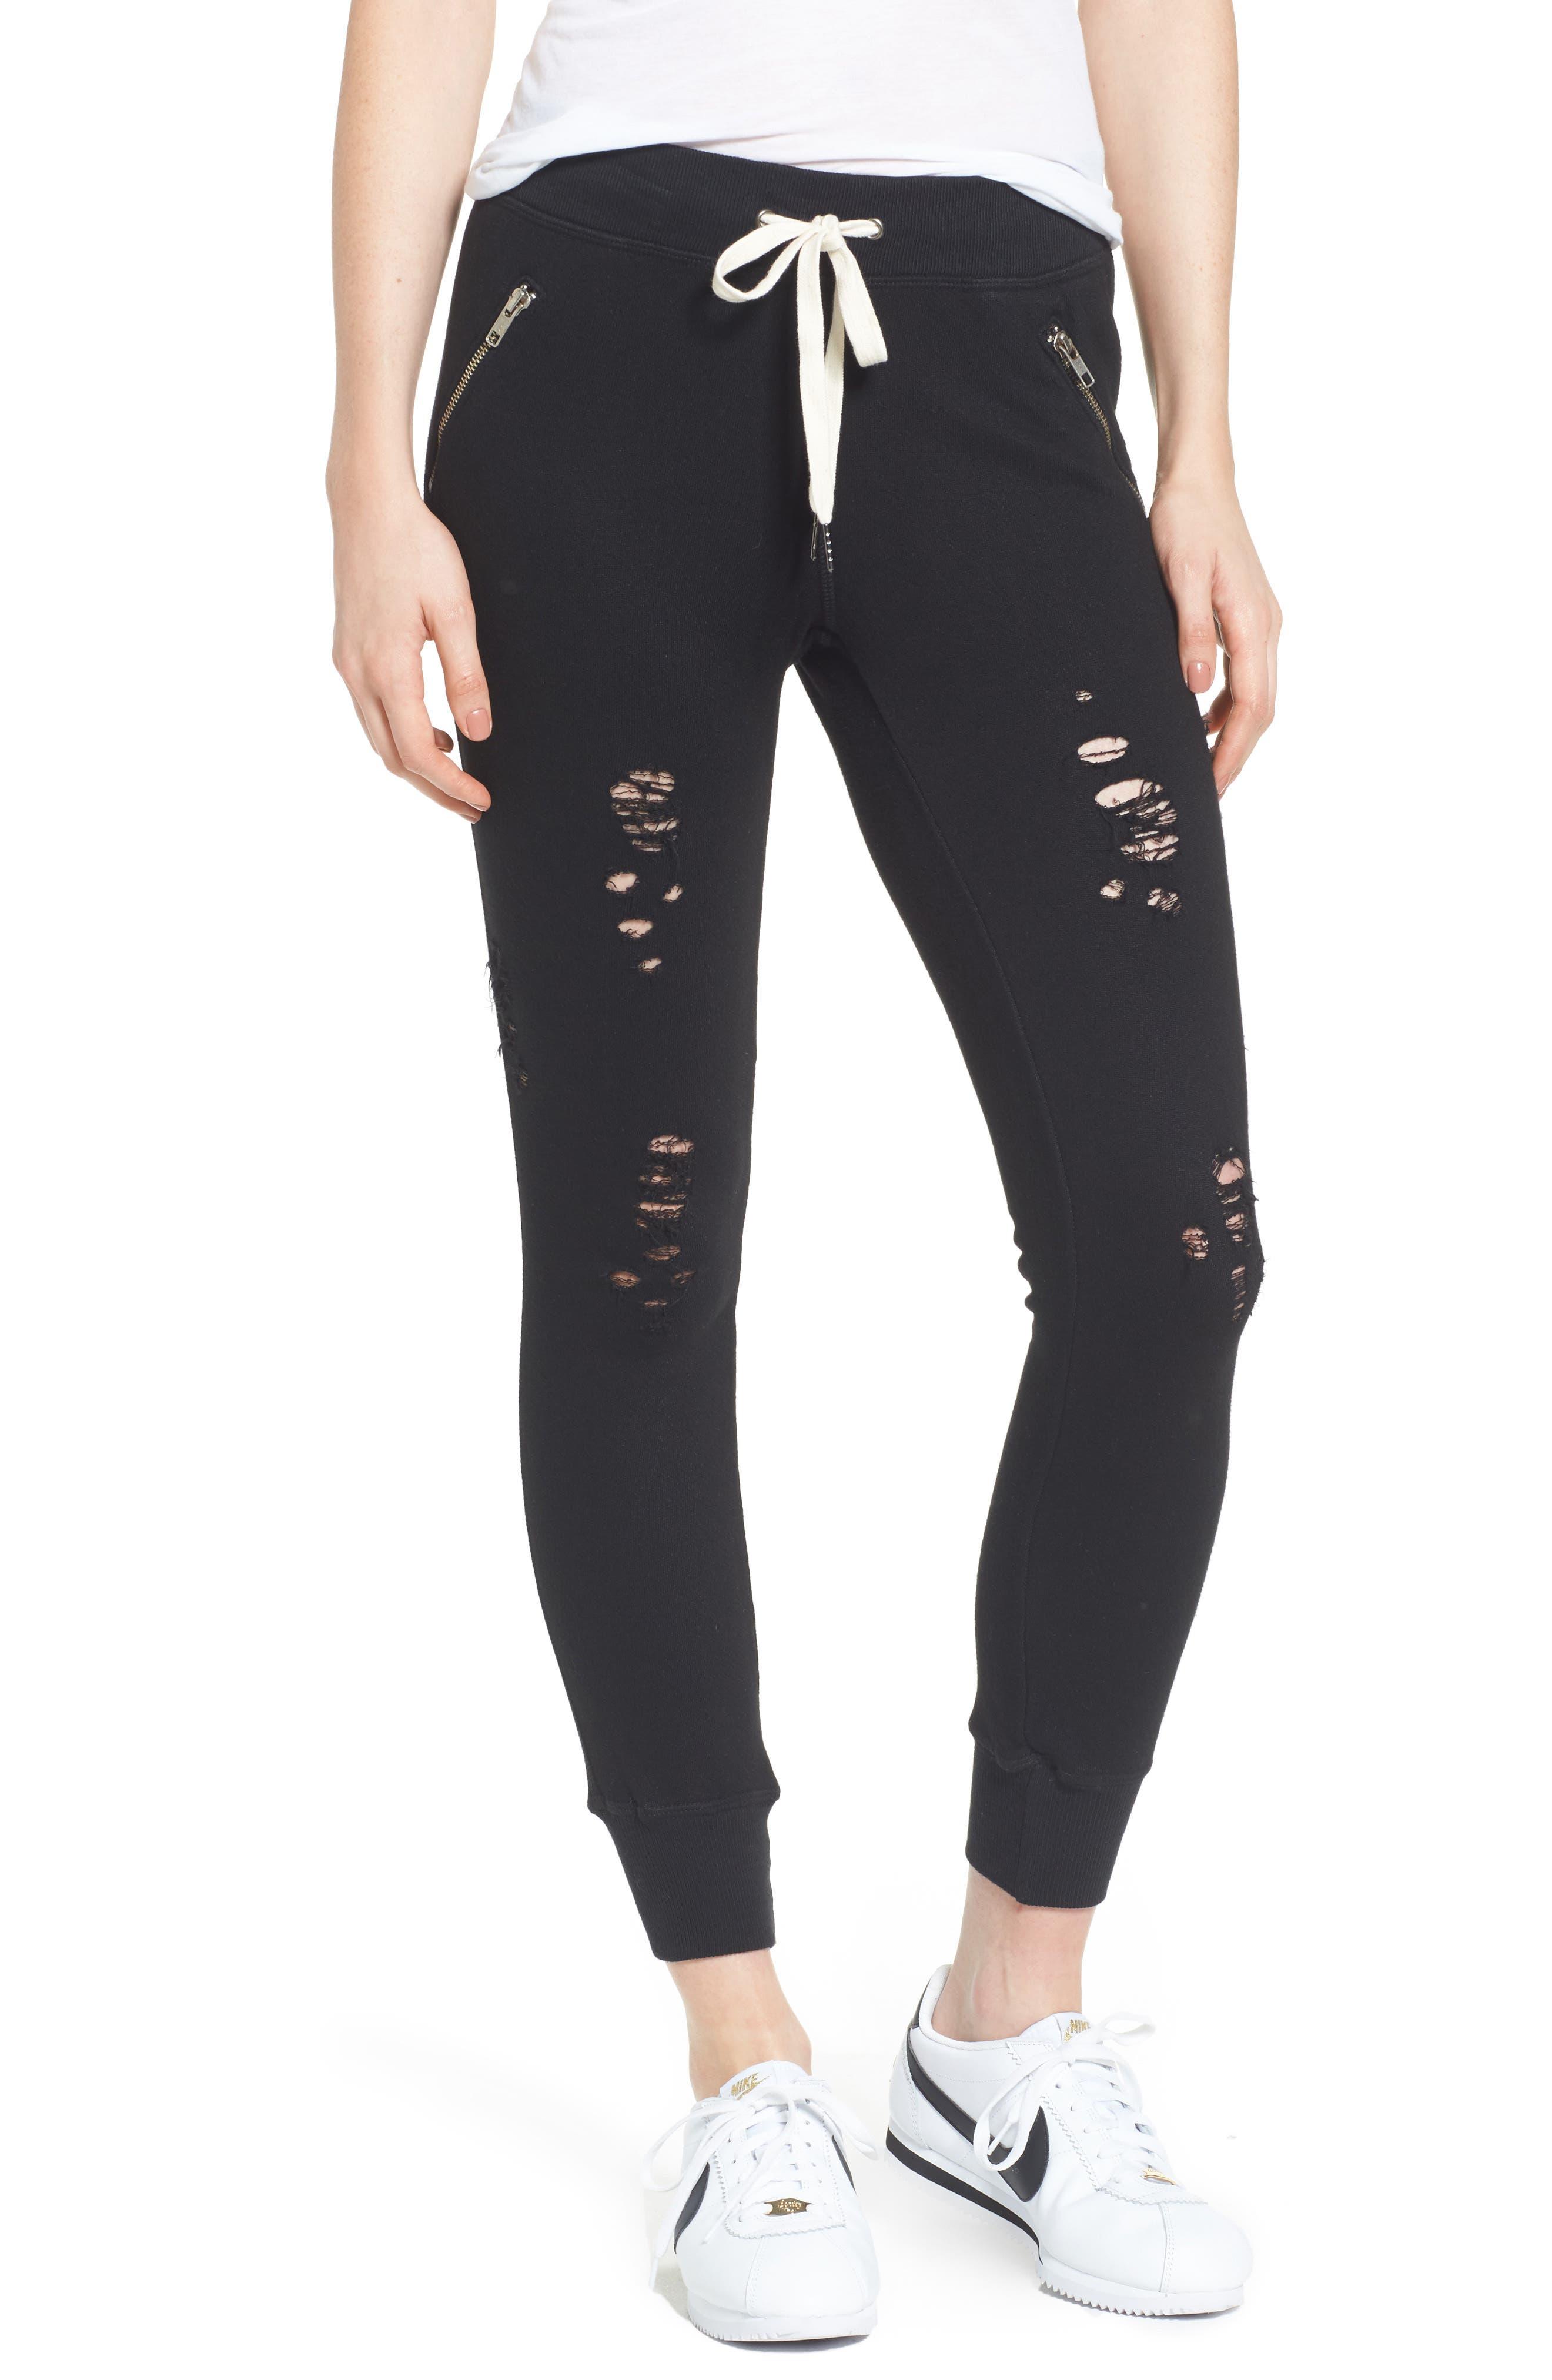 Gravity Sweatpants,                         Main,                         color, Black Cat